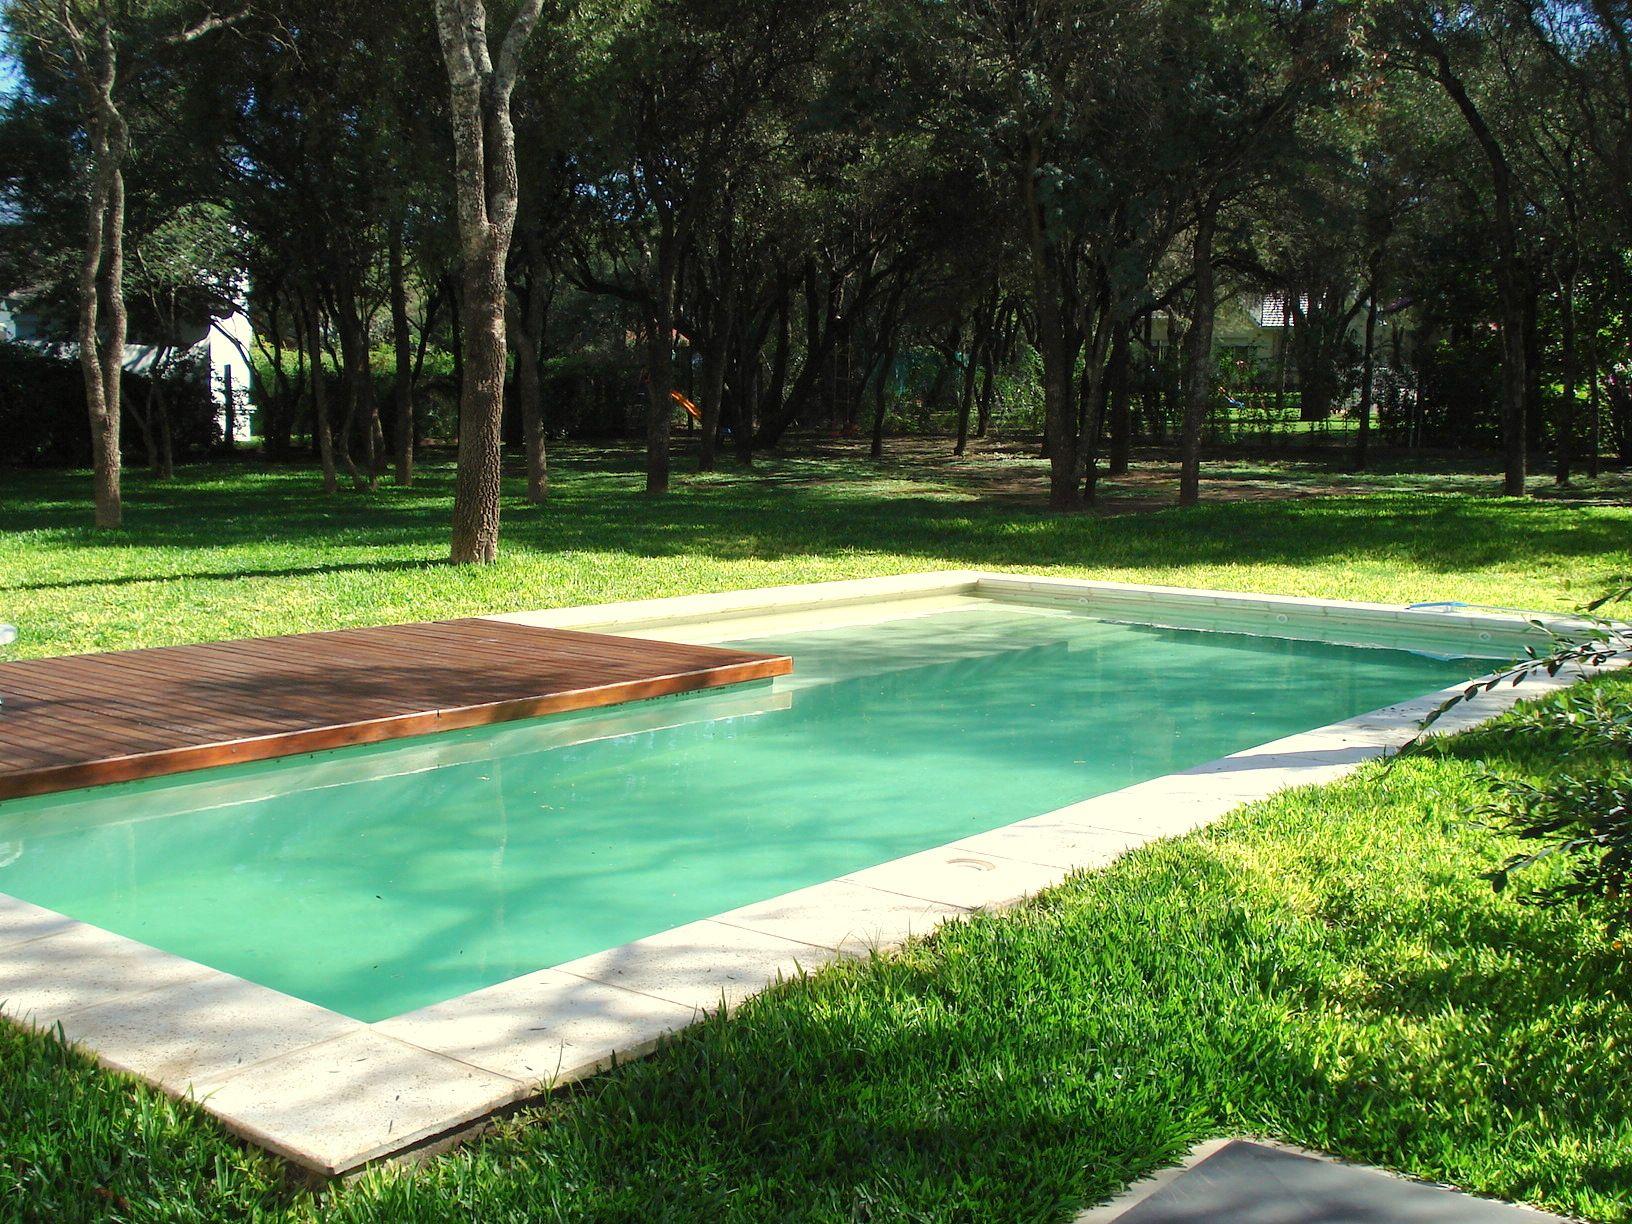 piscina - deck de madera - piscina - swimmingpool -diseÑo - design